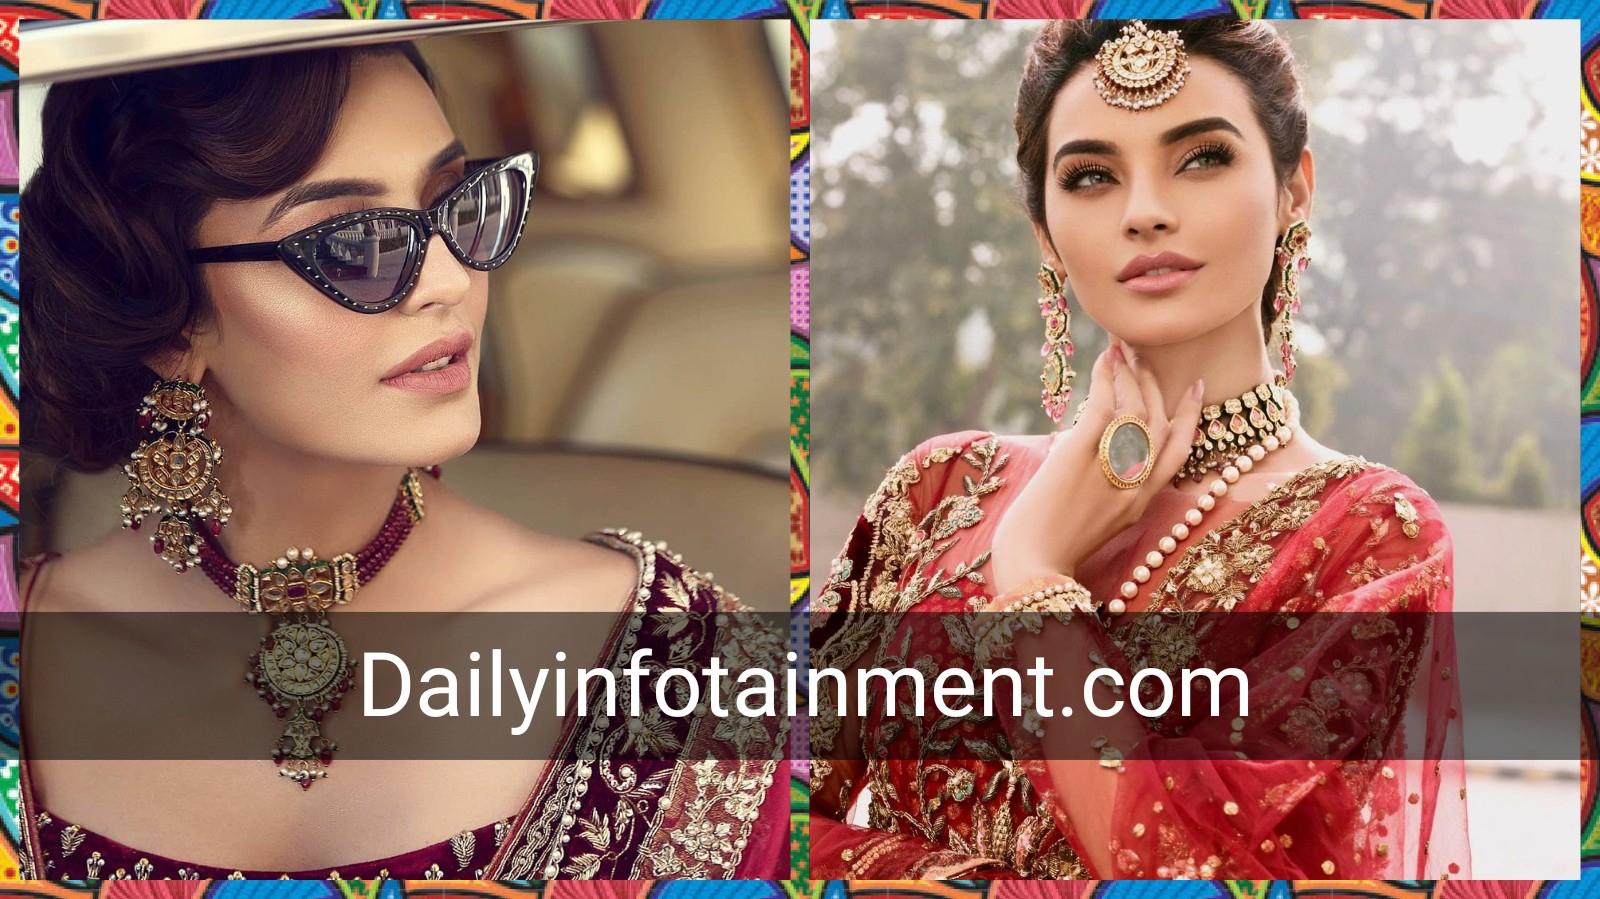 Sadia Khan Donning in Aesthetic Bridal Photo Shoot